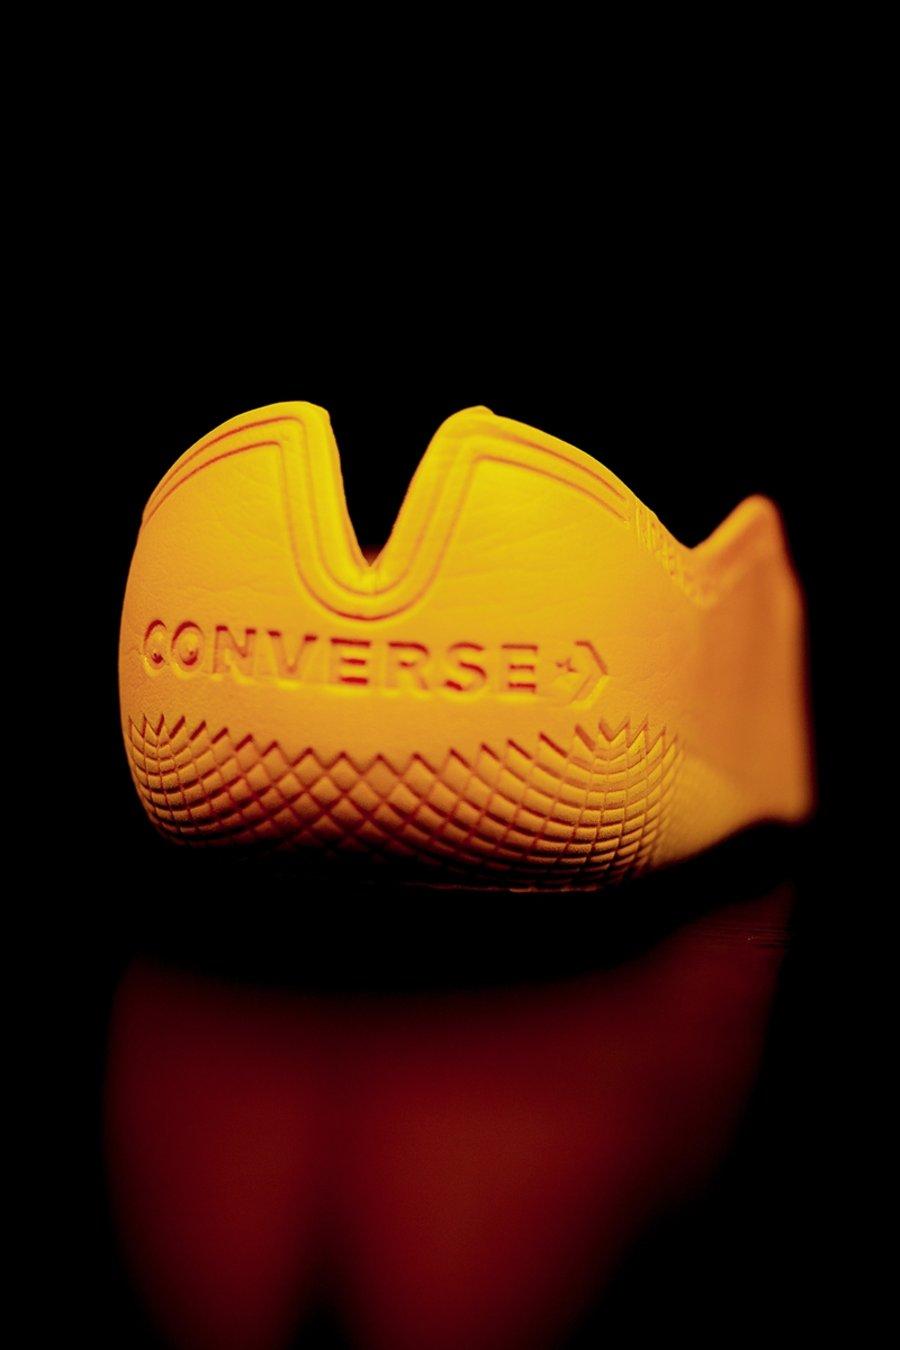 Converse,All Star Pro BB,React  竟搭载 Nike 缓震!这双 Converse 实战篮球鞋全是惊喜!